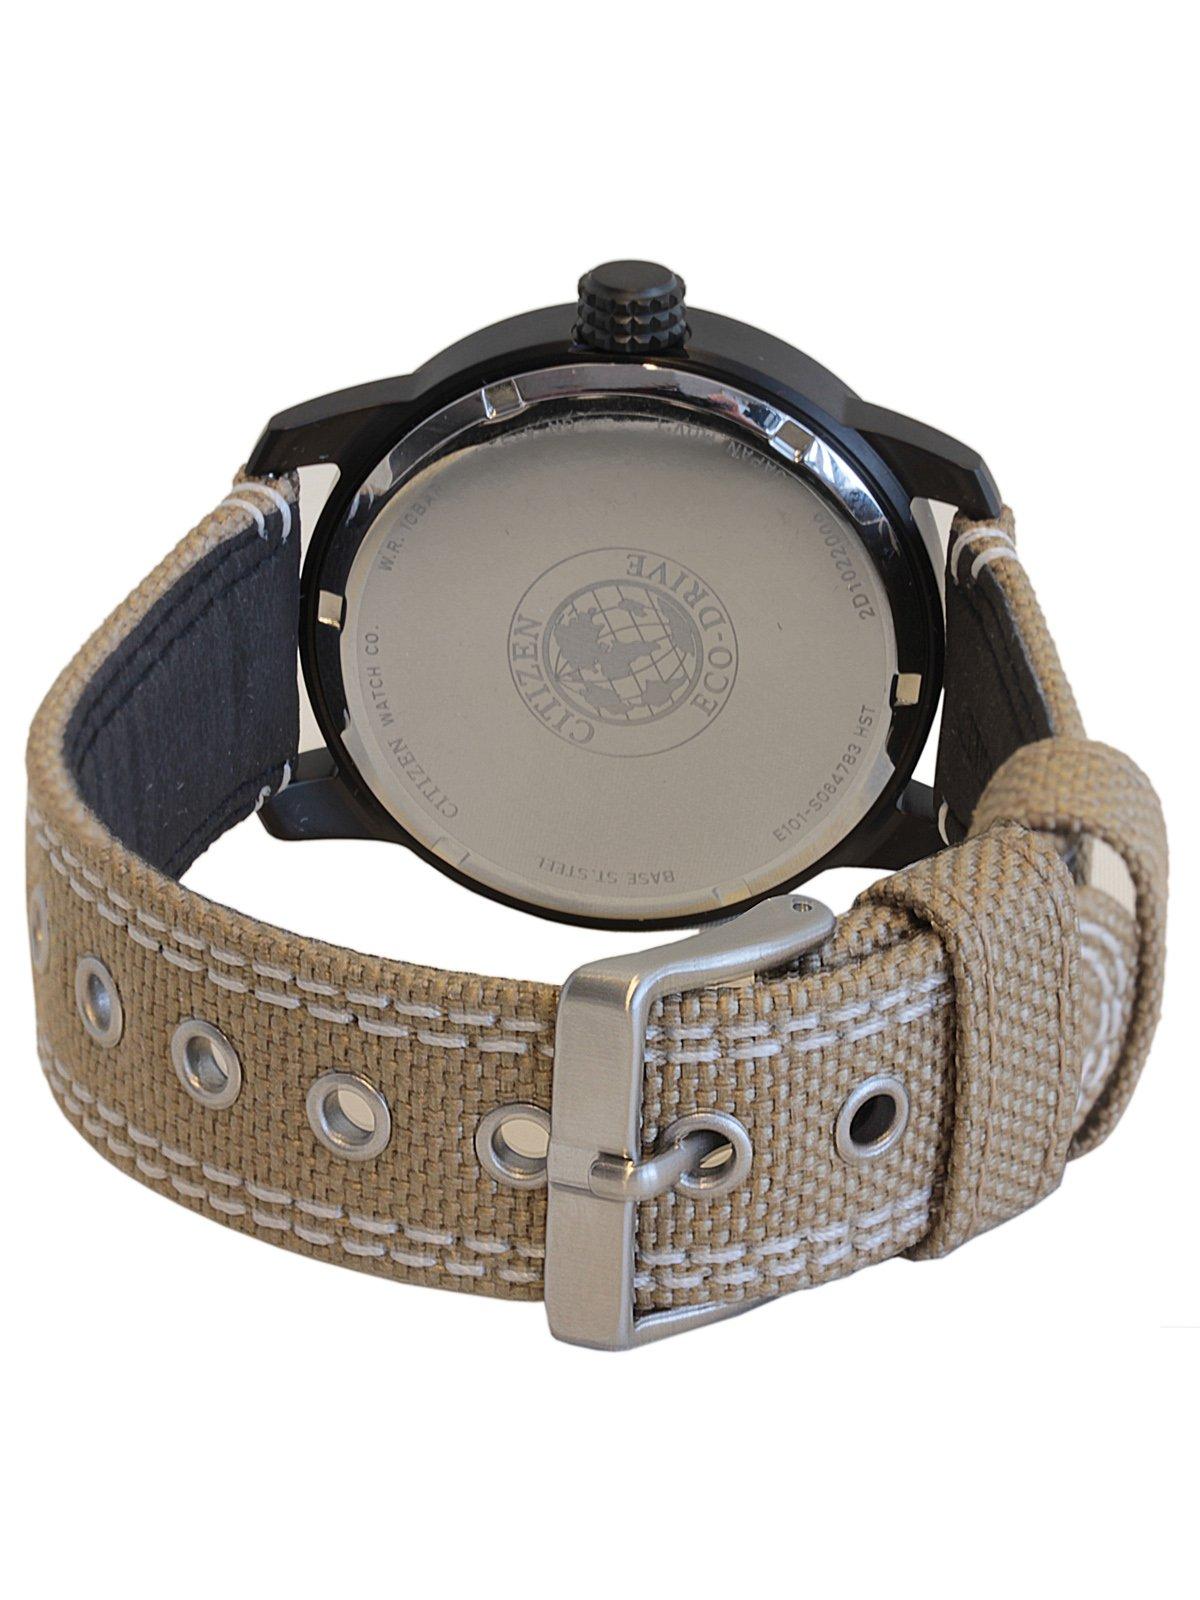 Citizen de hombre reloj de pulsera Elegance analógico de cuarzo, Eco Drive (Talla Única, Negro) 2